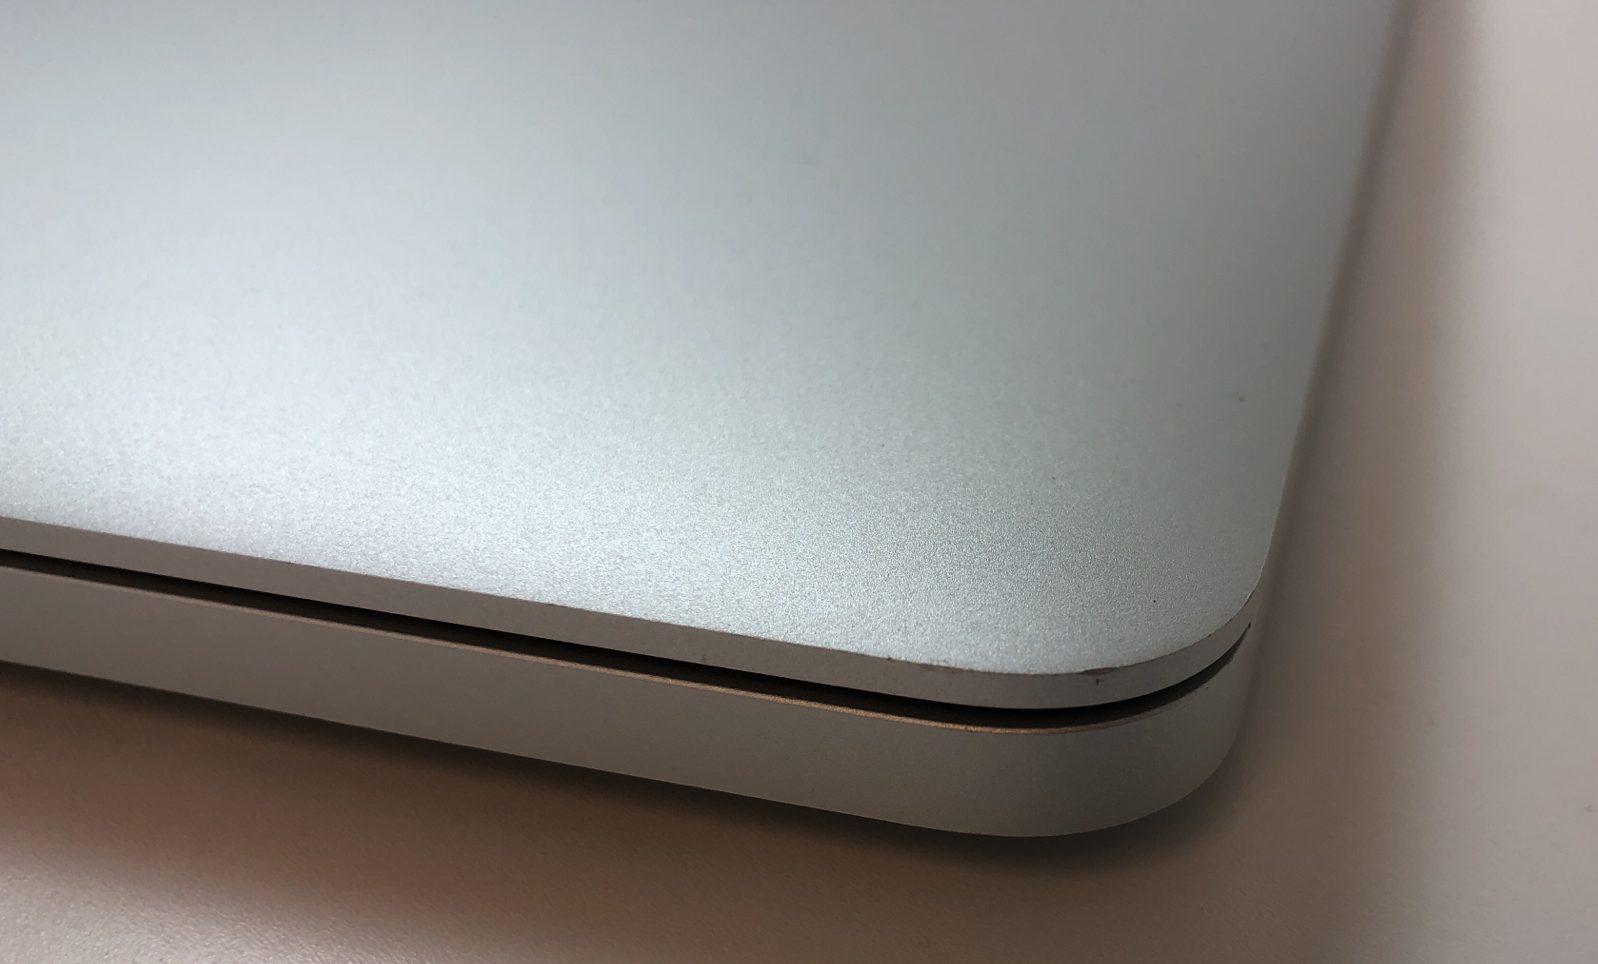 "MacBook Pro Retina 13"" Early 2015 (Intel Core i5 2.9 GHz 8 GB RAM 512 GB SSD), Intel Core i5 2.9 GHz, 8 GB RAM, 512 GB SSD, image 3"